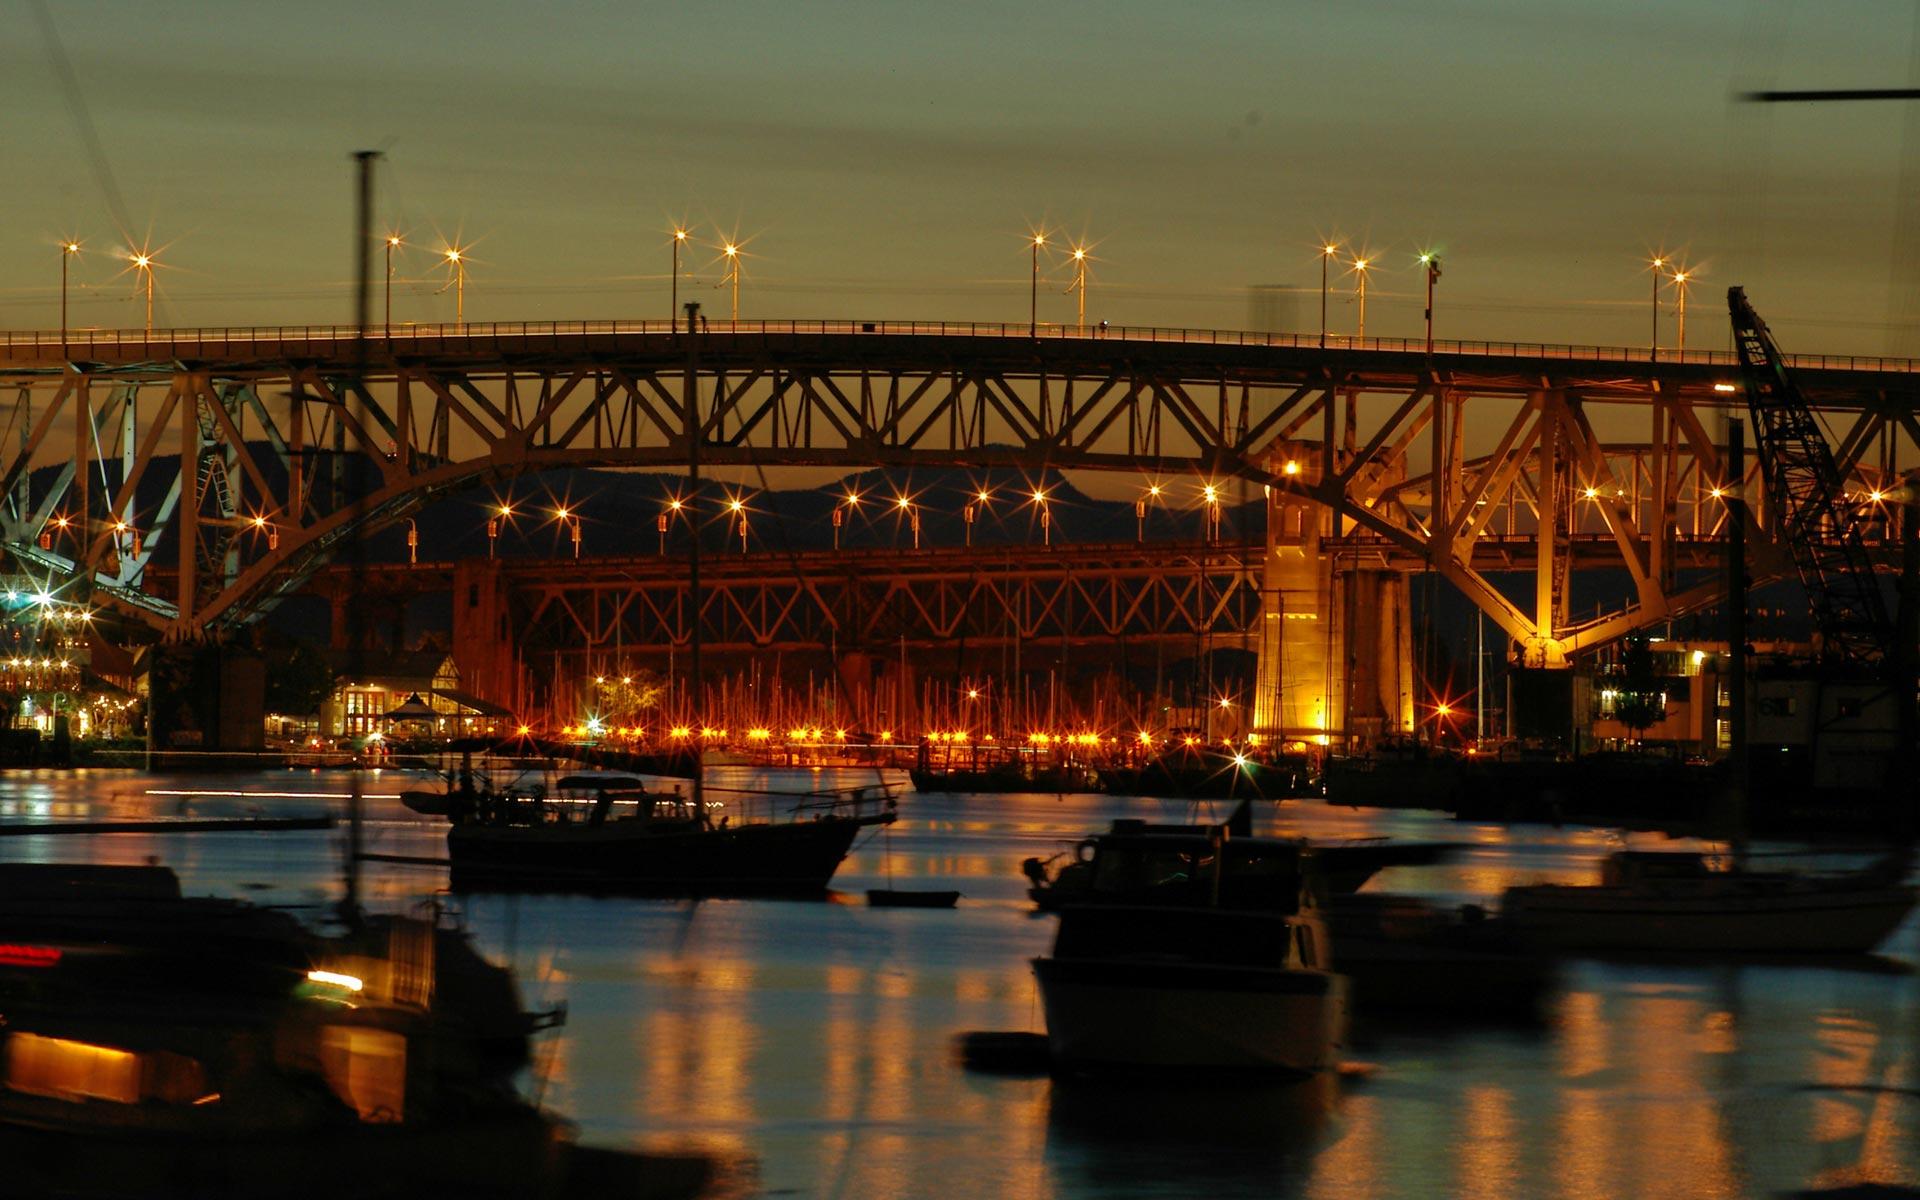 http://danutzayy.files.wordpress.com/2010/04/night-city-lights-wallpapers-pack-3-02.jpg